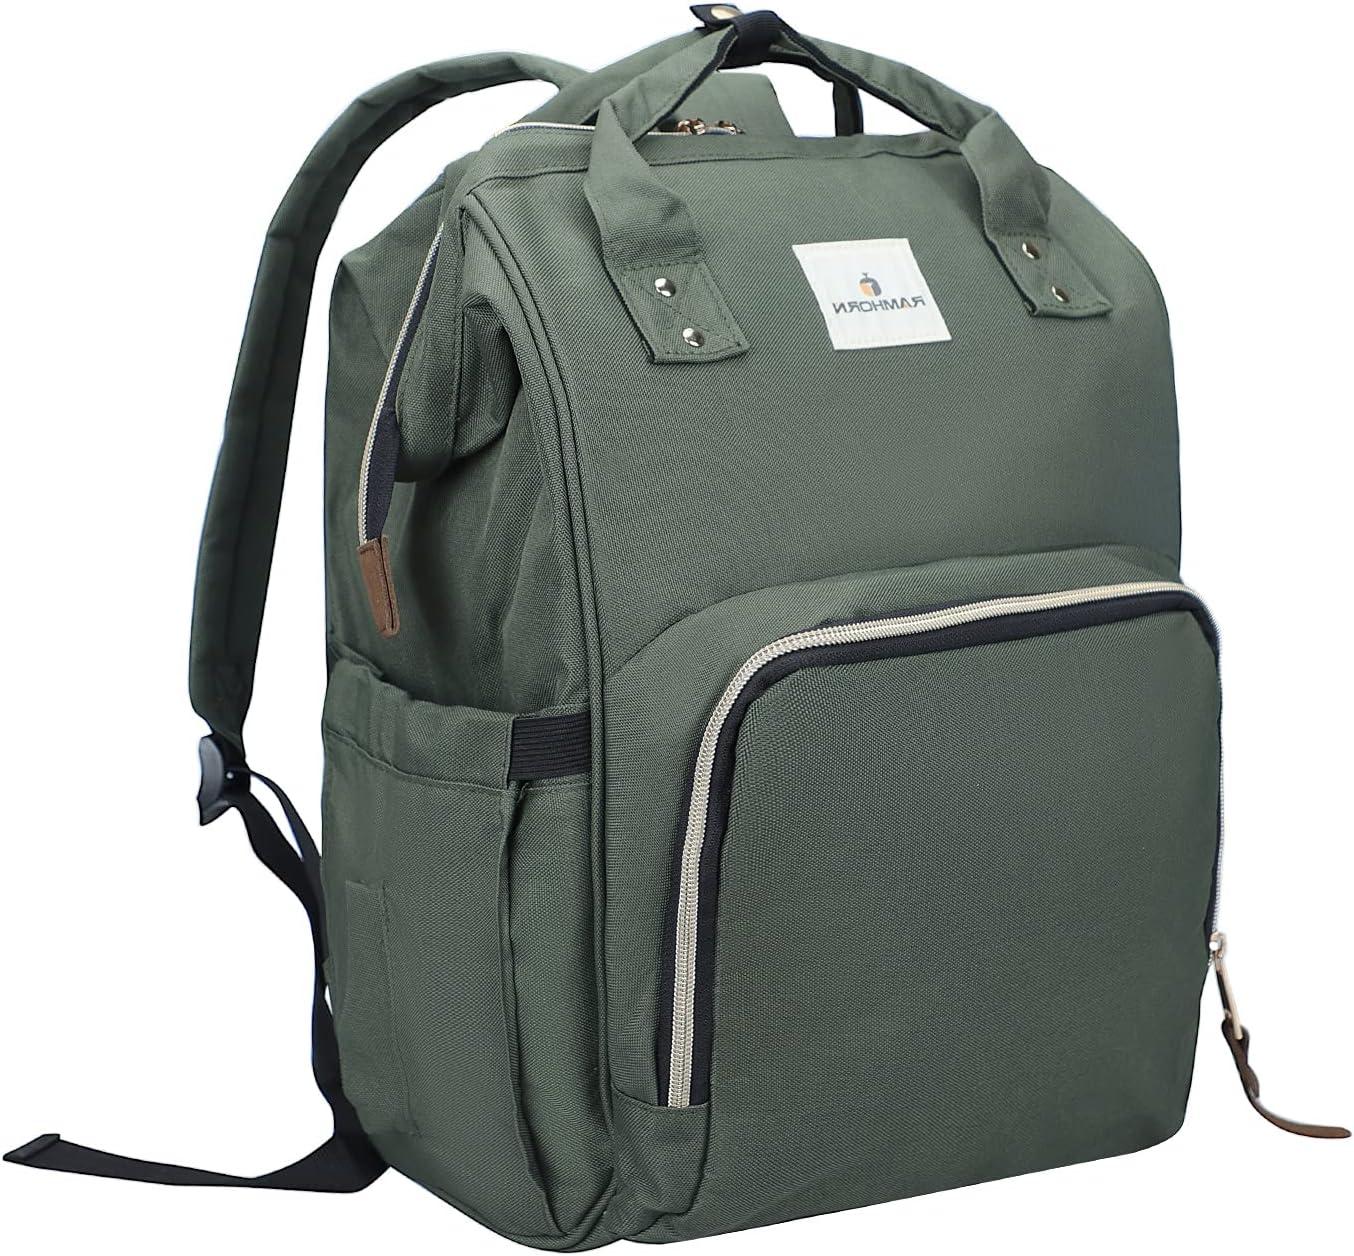 RAMHORN Diaper Bag Backpack Multifunction Waterproof Travel Back Pack for Mom Green